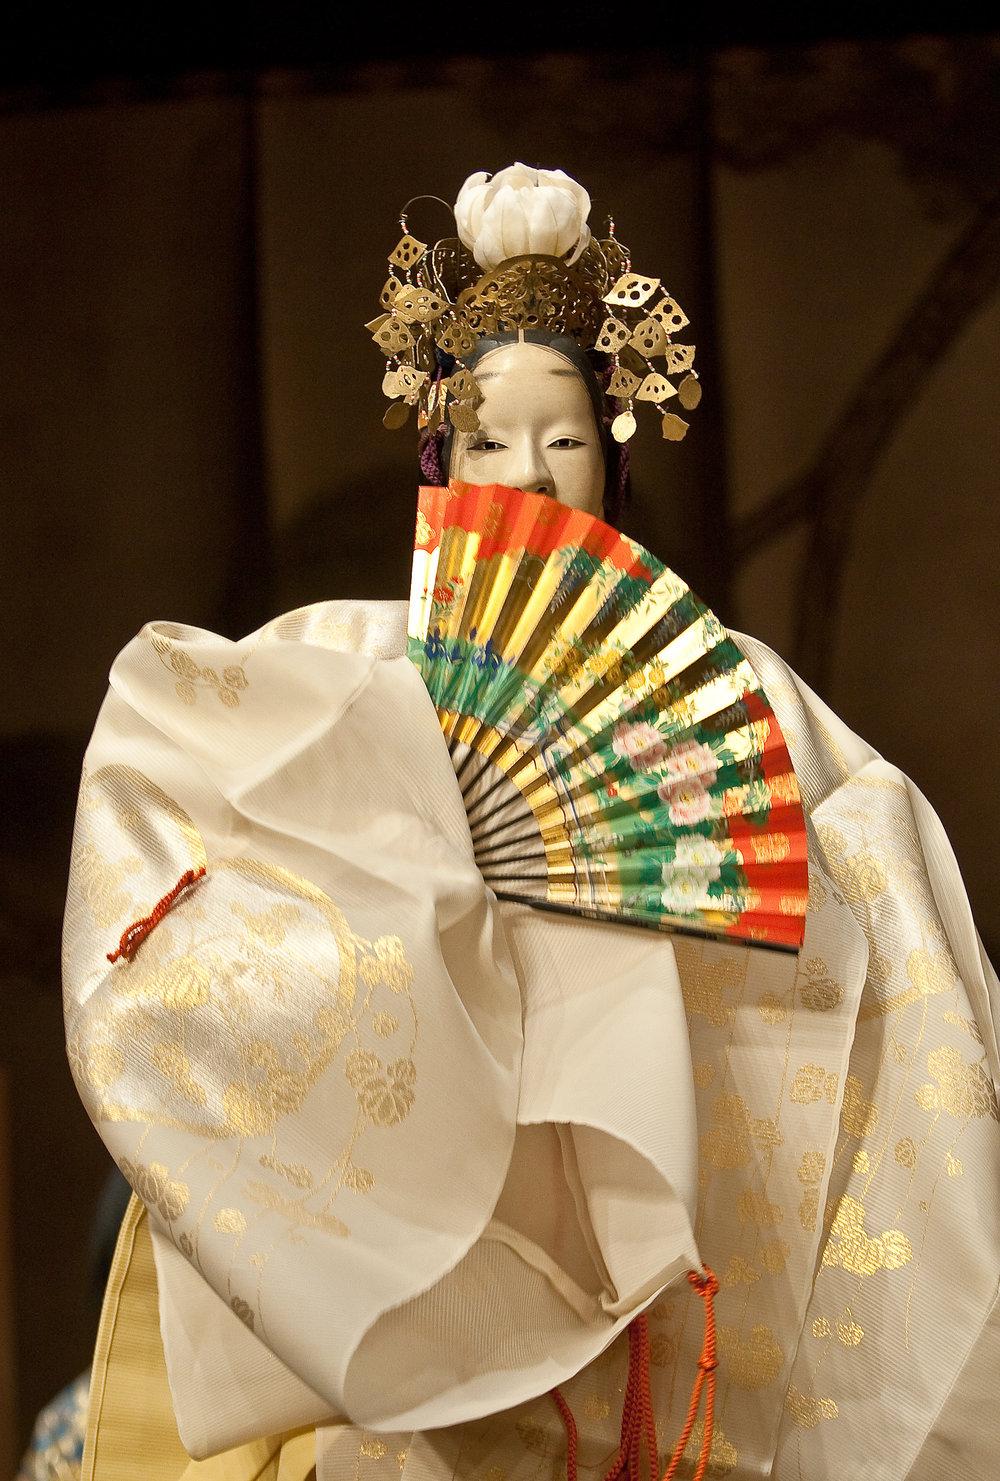 Kinue Oshima as the Pagoda Nochi-shite.Photography by Clive Barda